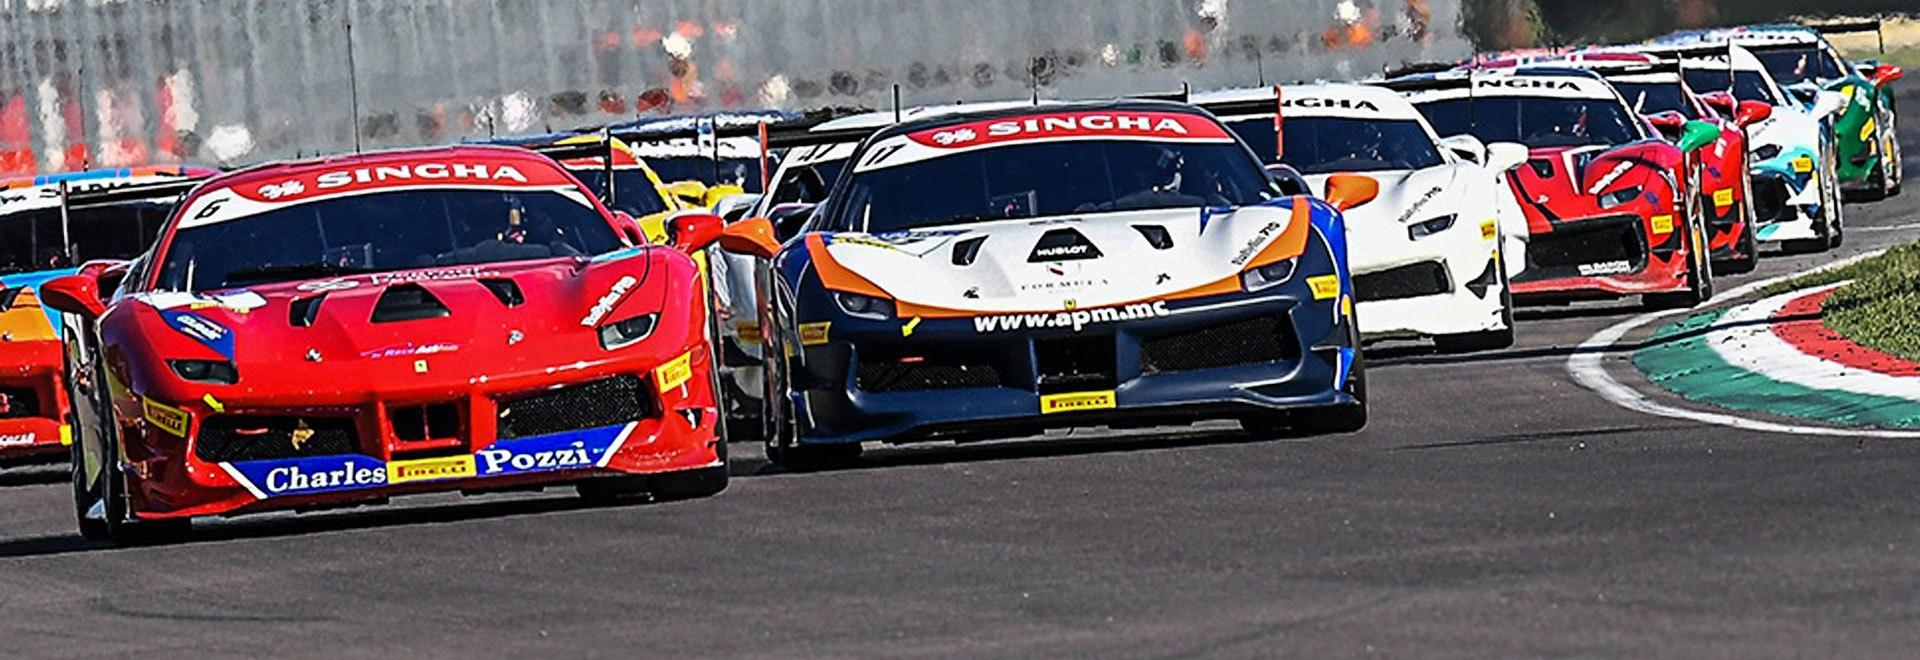 Trofeo Pirelli Barcellona. Gara 1